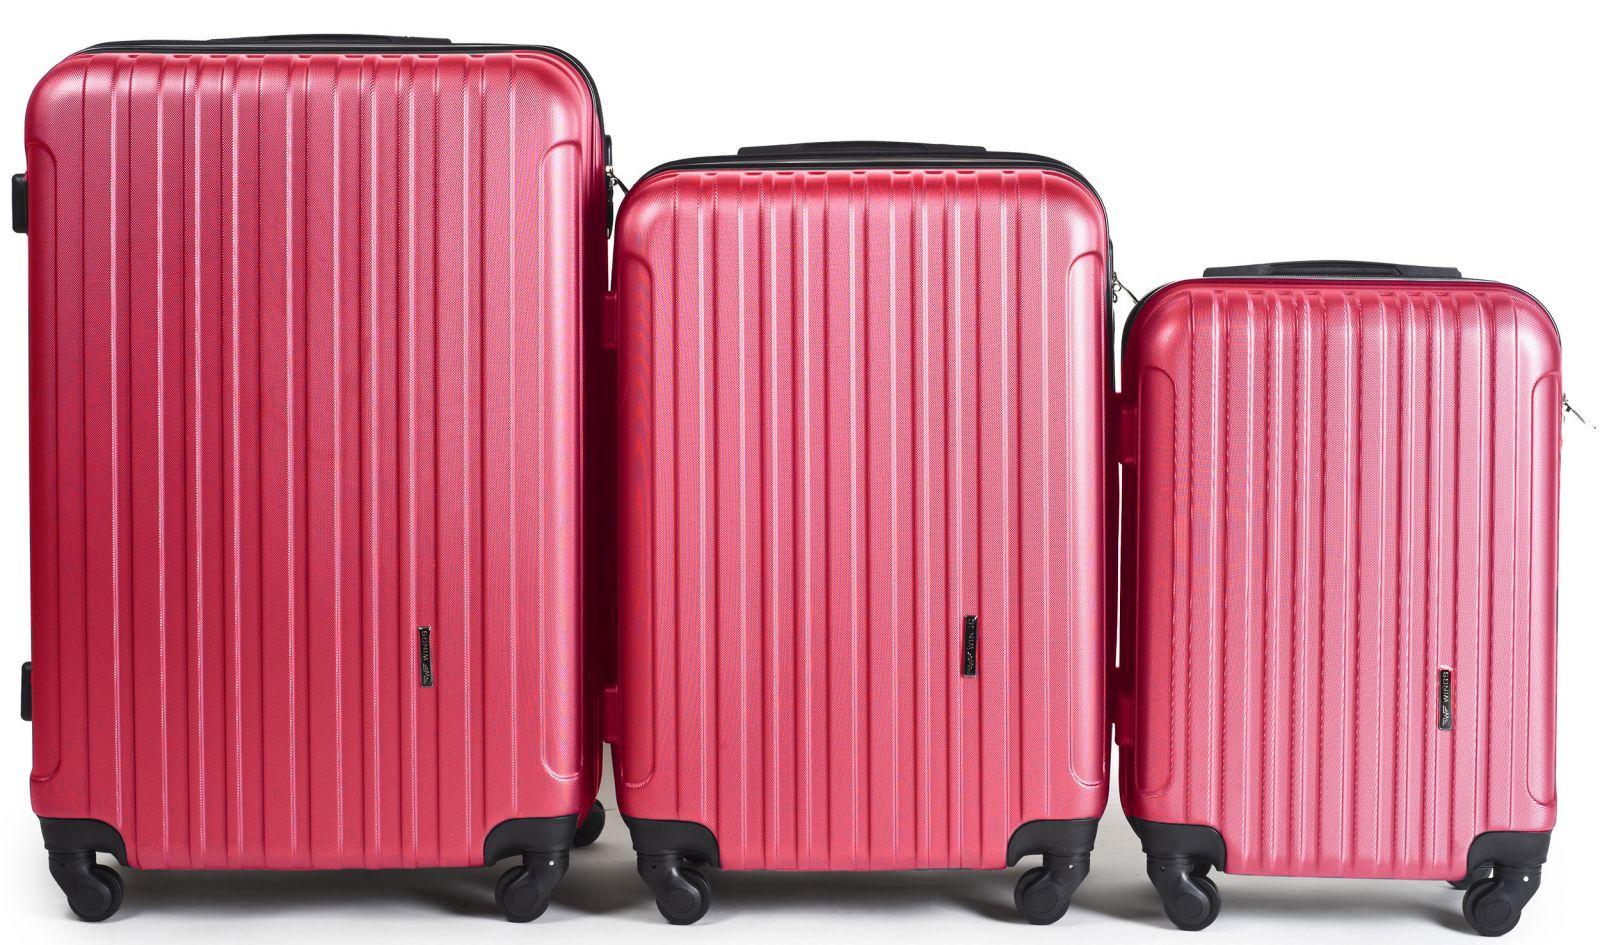 Cestovní kufry sada WINGS 2011 ABS ROSE RED L,M,S